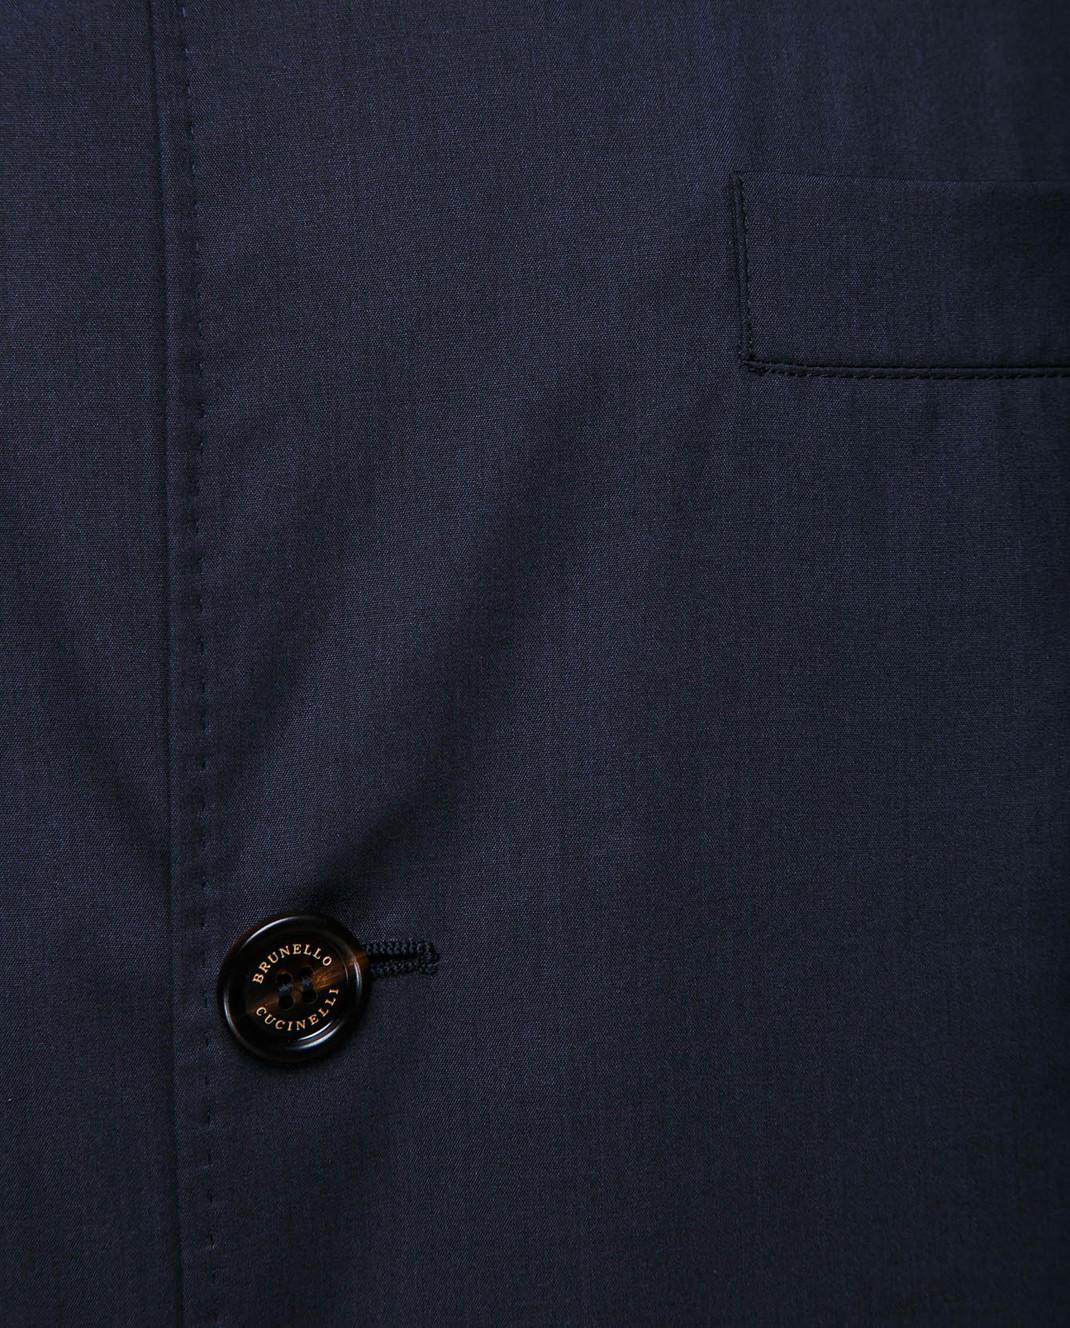 Brunello Cucinelli Темно-синий пиджак MH4626132 изображение 5